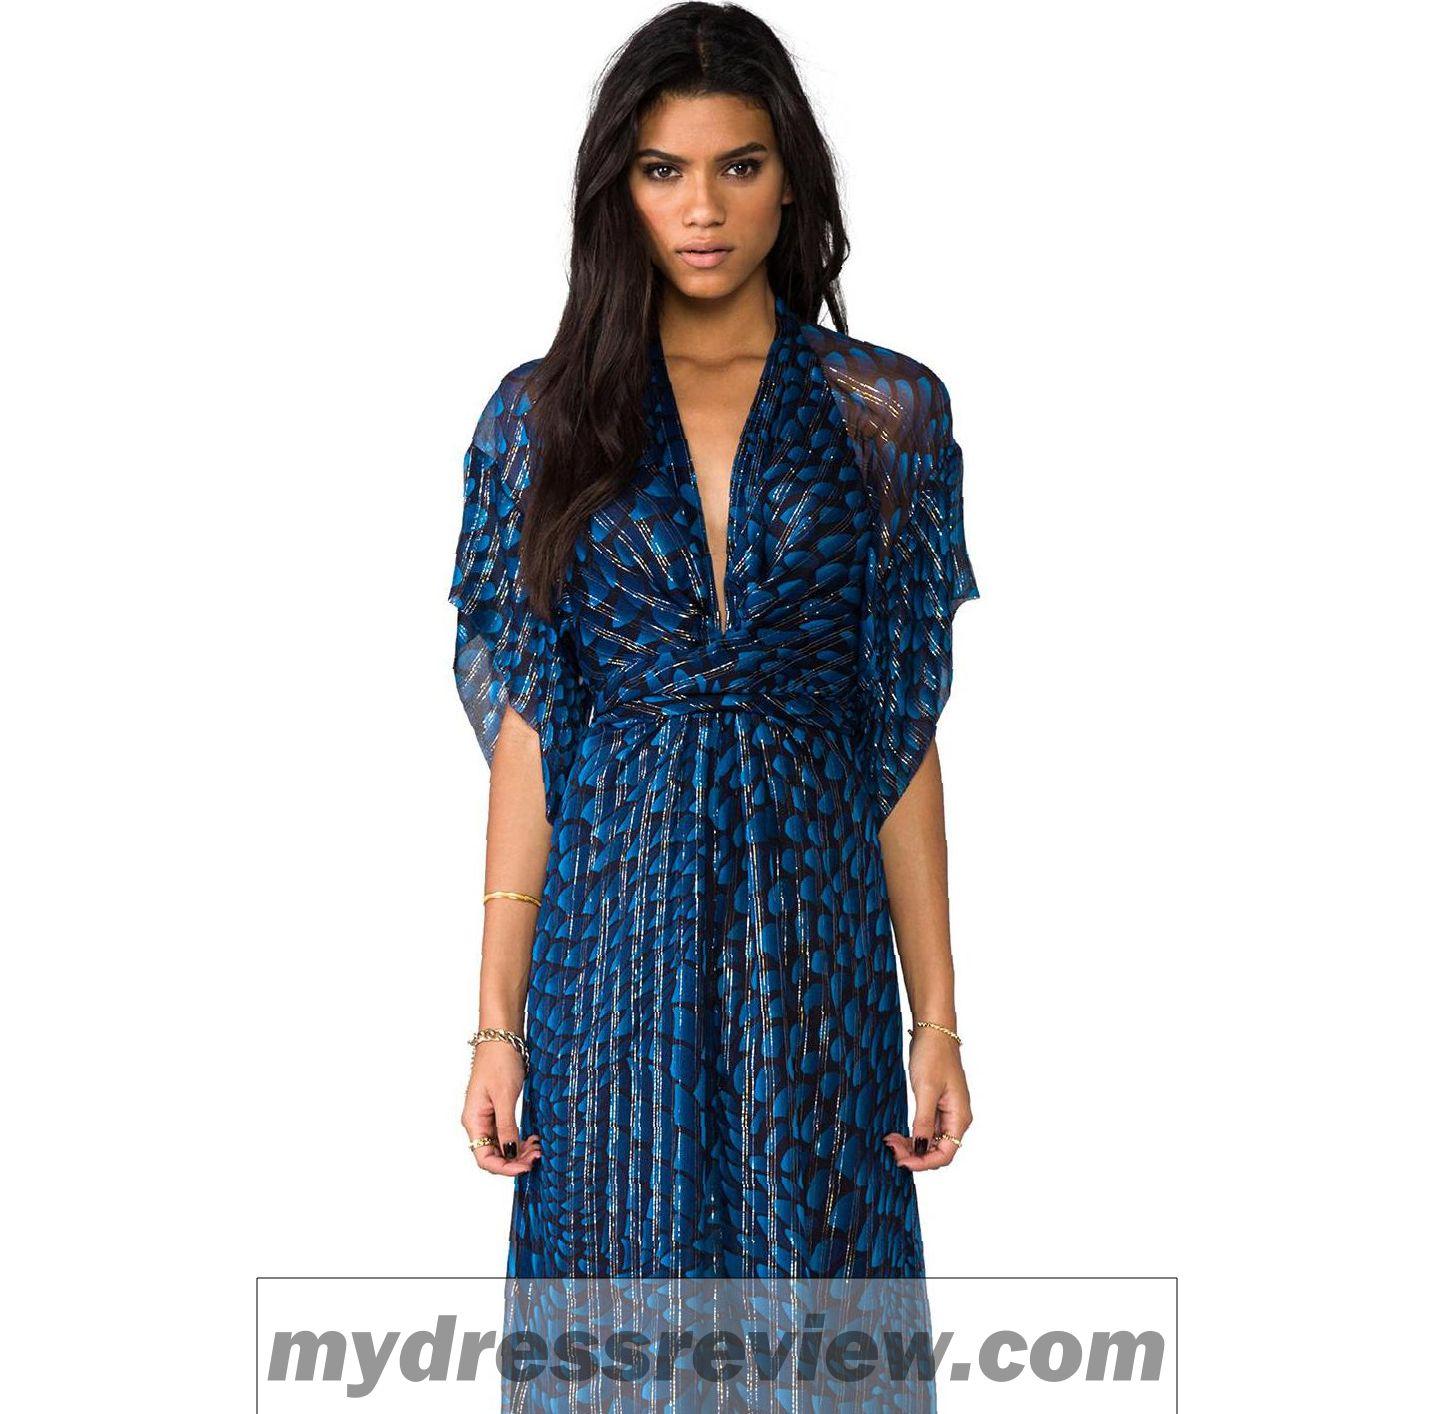 Maxi Dress On Short Girl : Trend 2017-2018